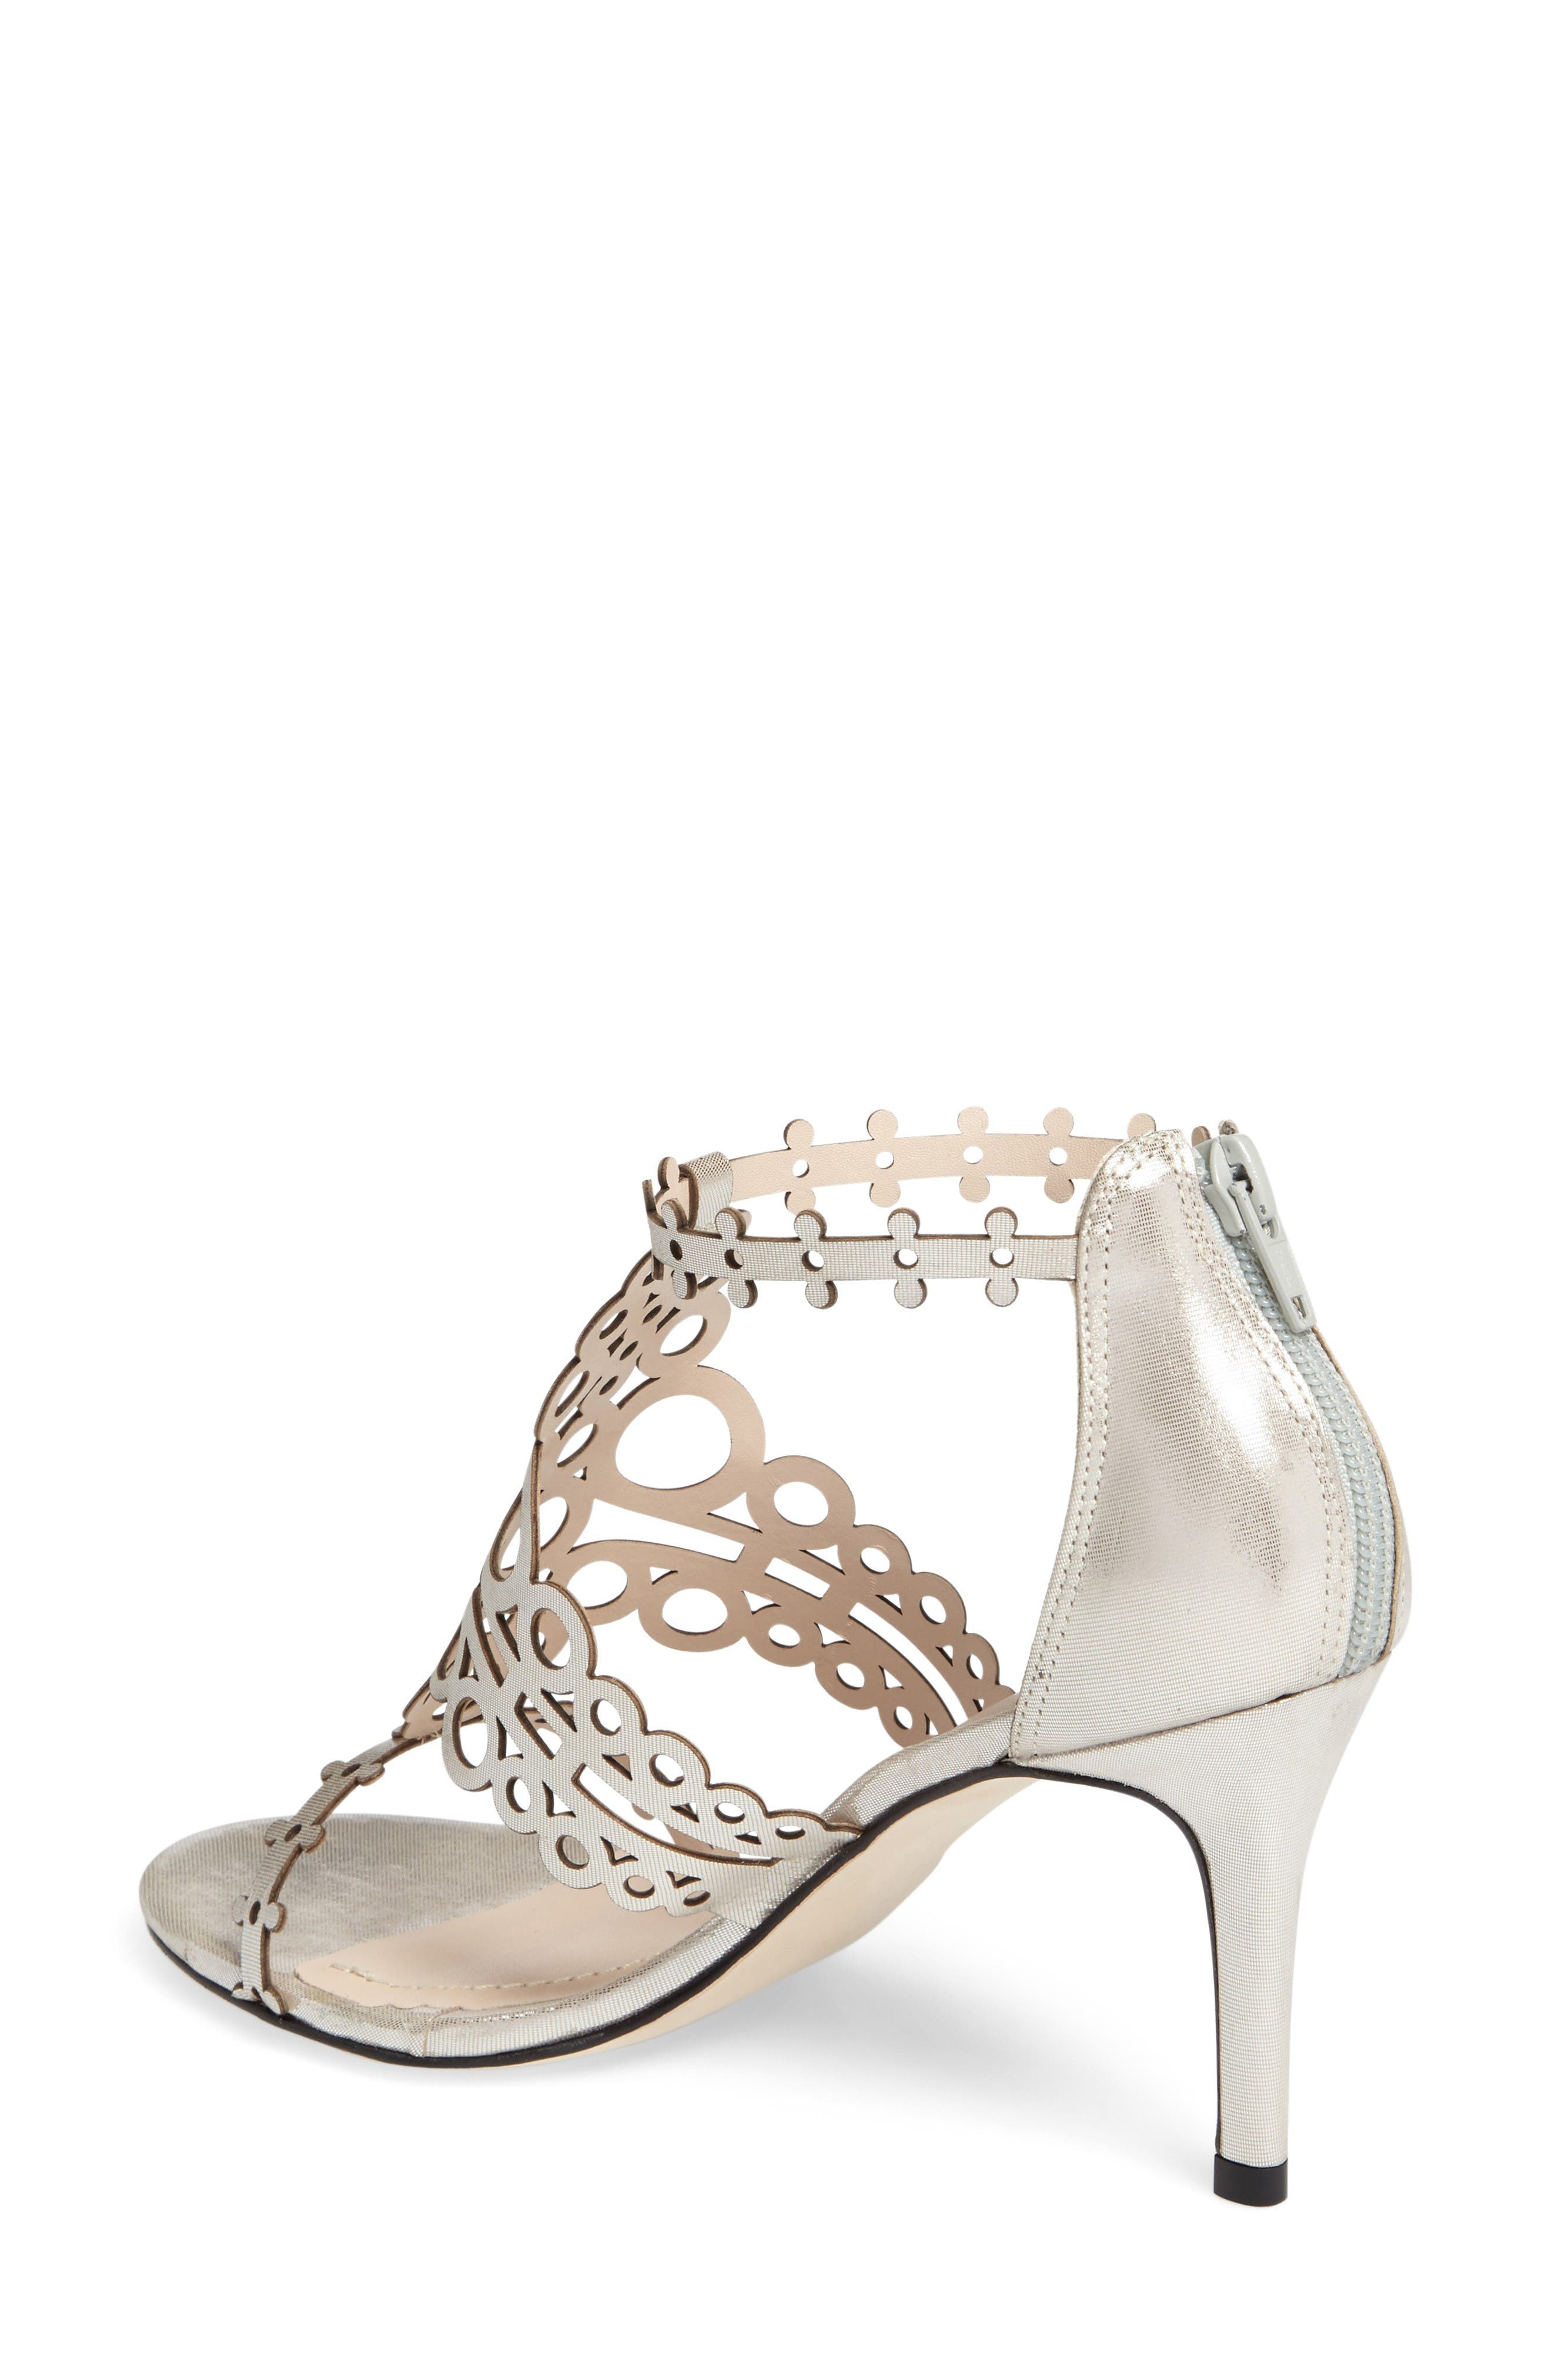 'Antonia' Laser Cut T-Strap Sandal,                             Alternate thumbnail 2, color,                             Silver Leather